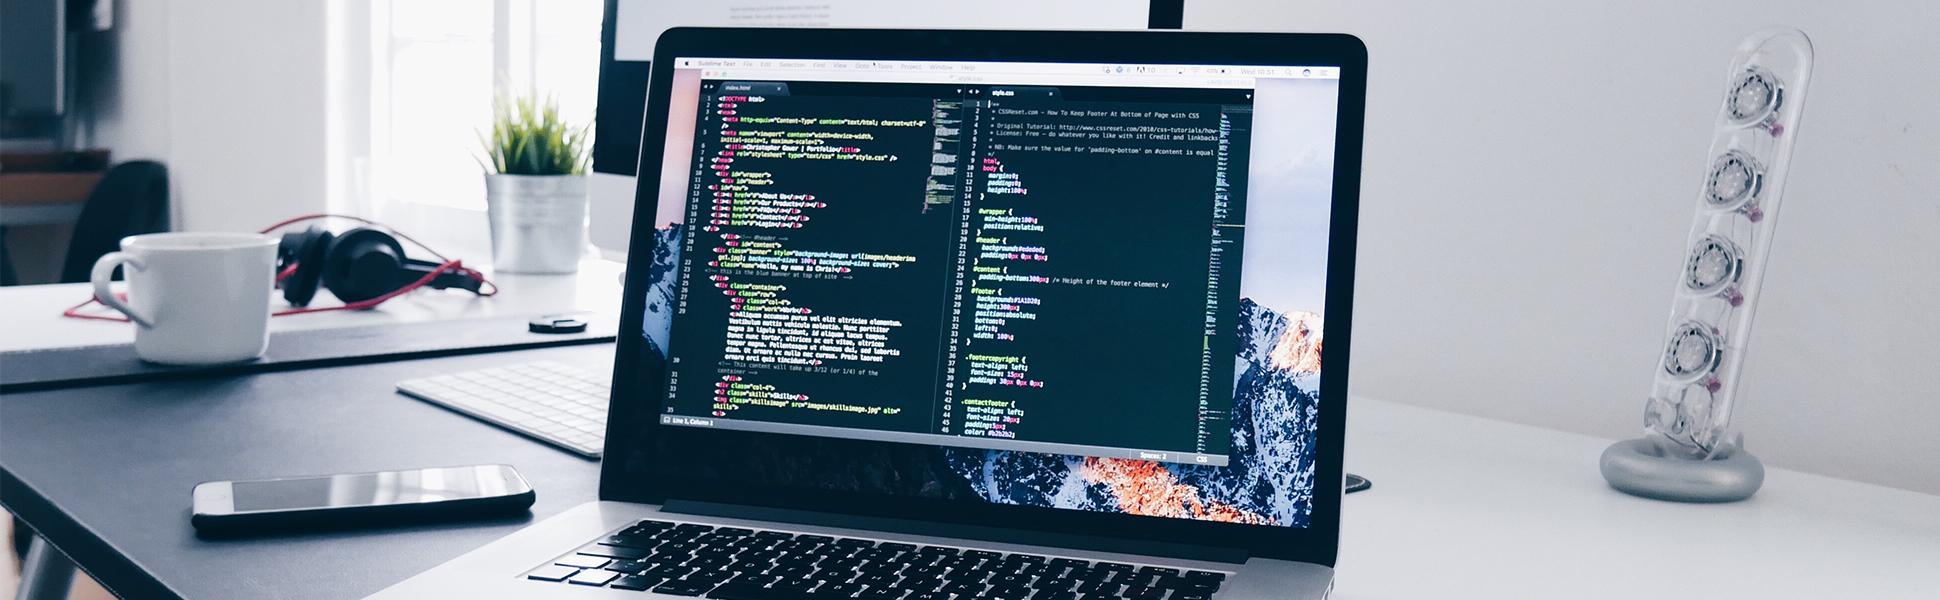 Web development full width